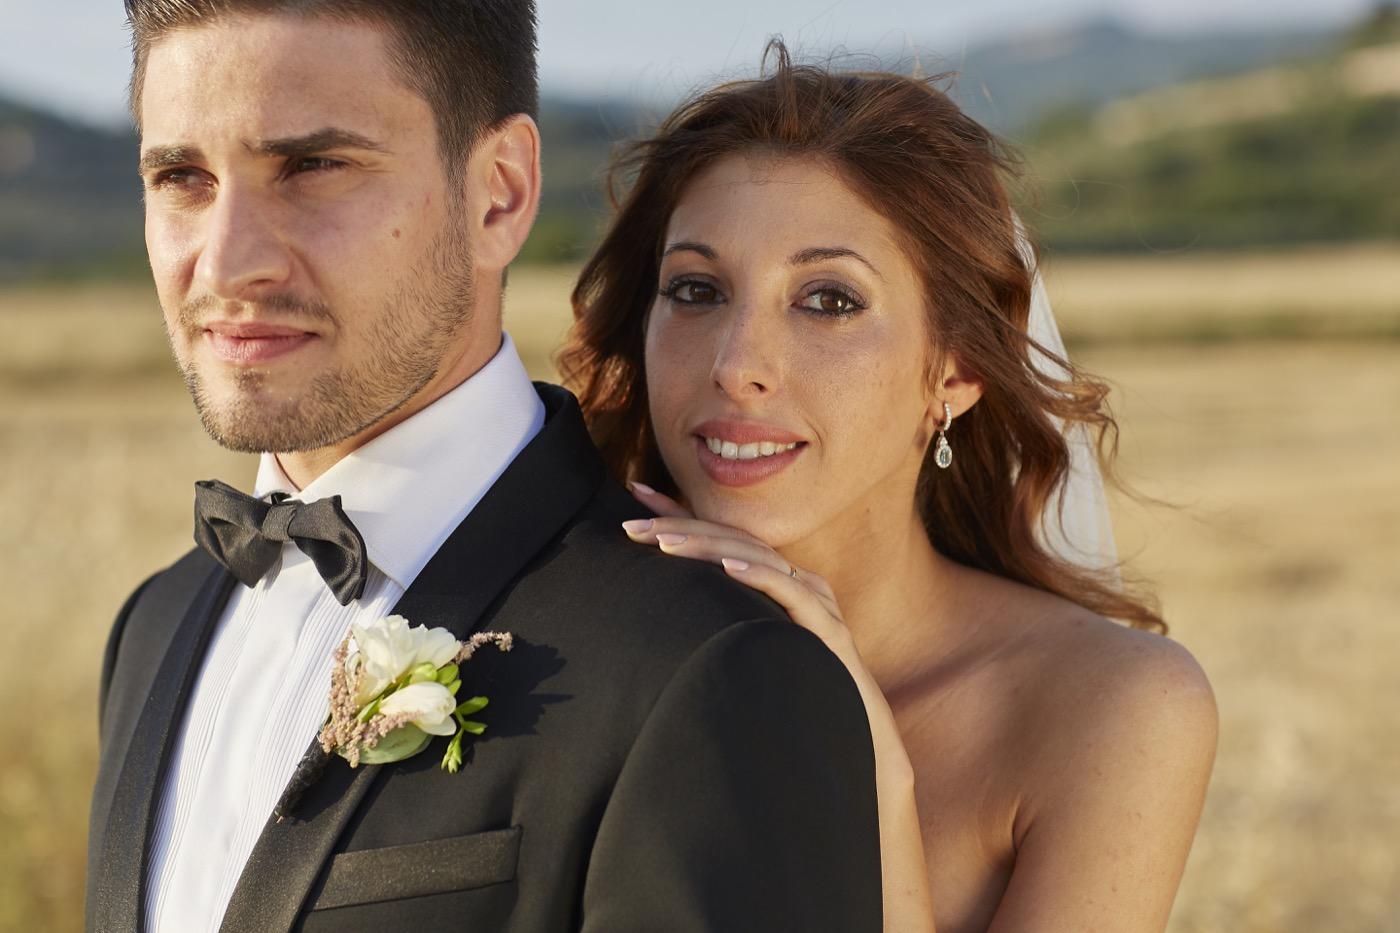 Claudio-Coppola-wedding-photographer-abbazia-7-frati-piegaro-61